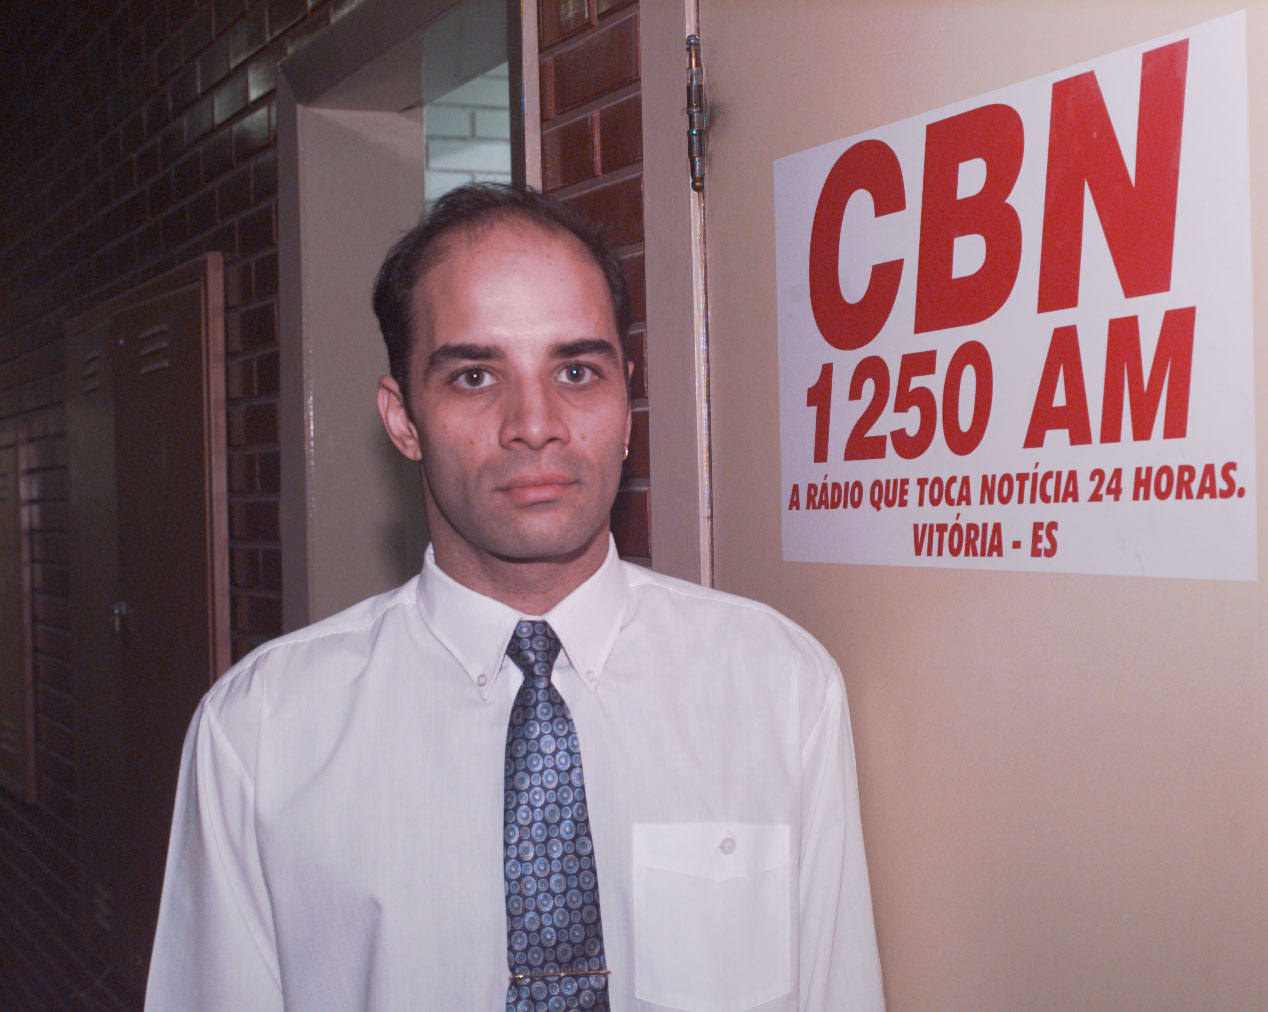 Fábio Pirajá - Estúdio da Rádio CBN 1250AM - 1997